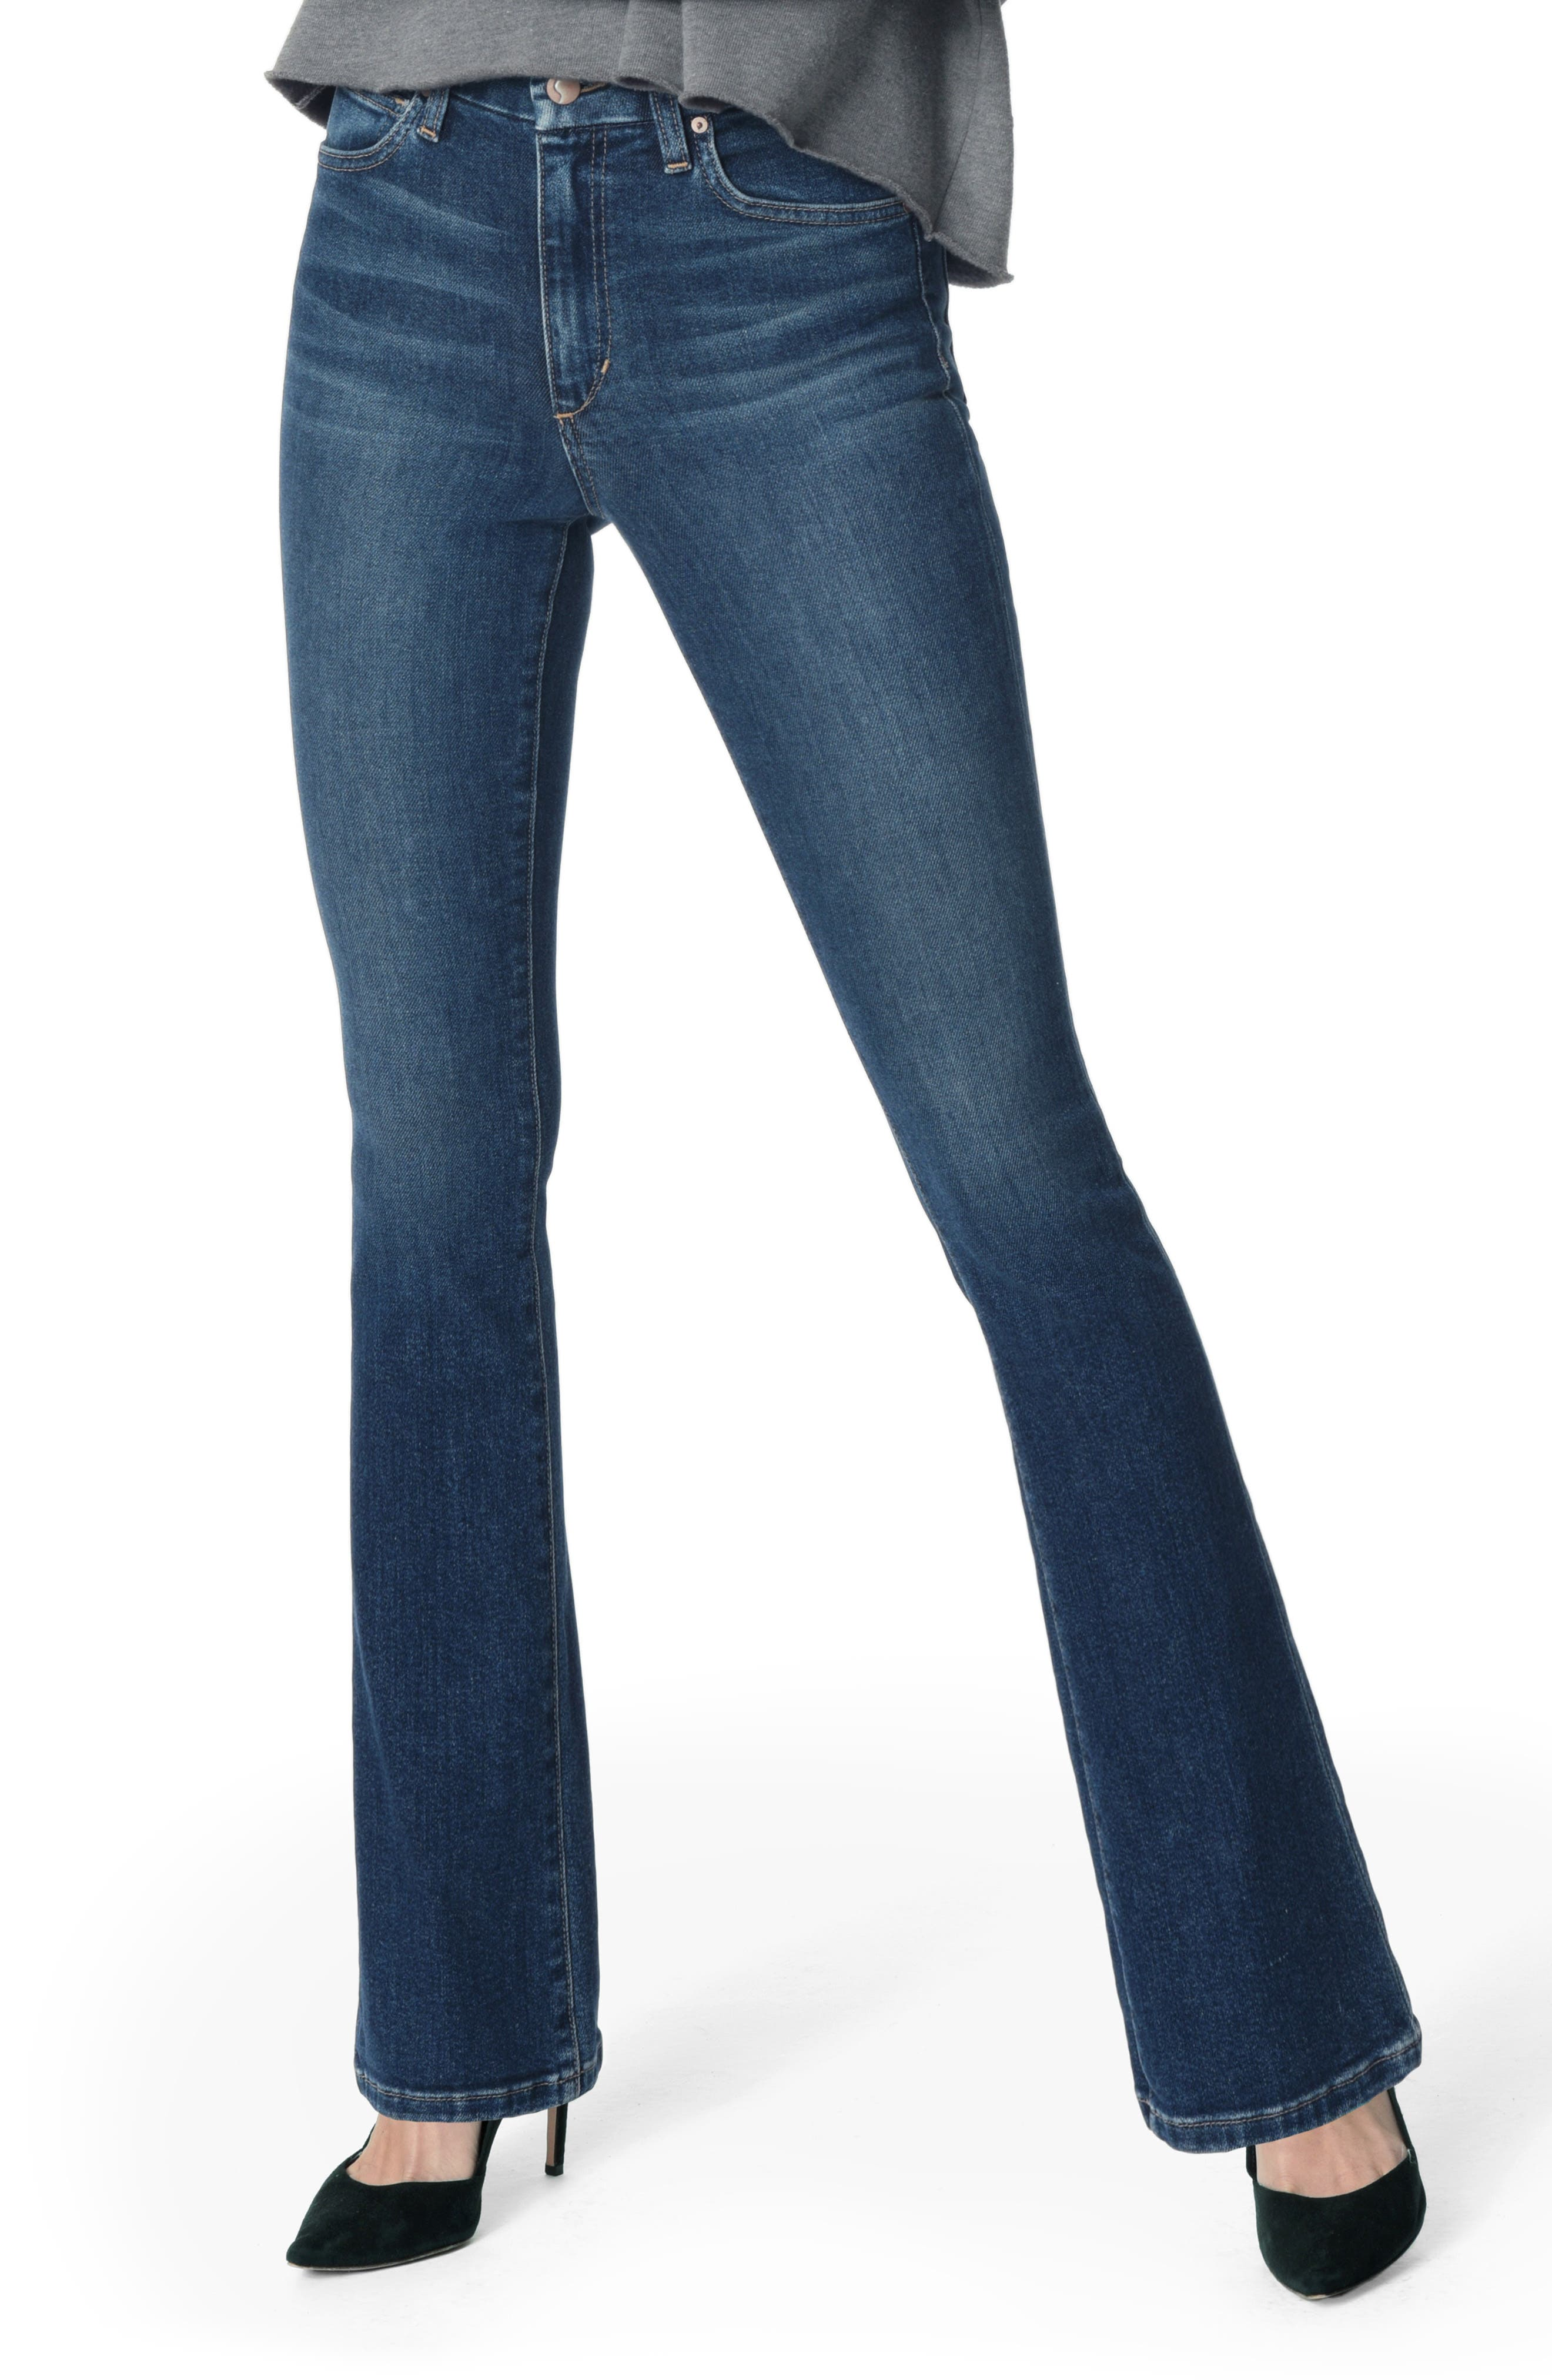 JOE'S Honey Curvy High Waist Bootcut Jeans, Main, color, 420